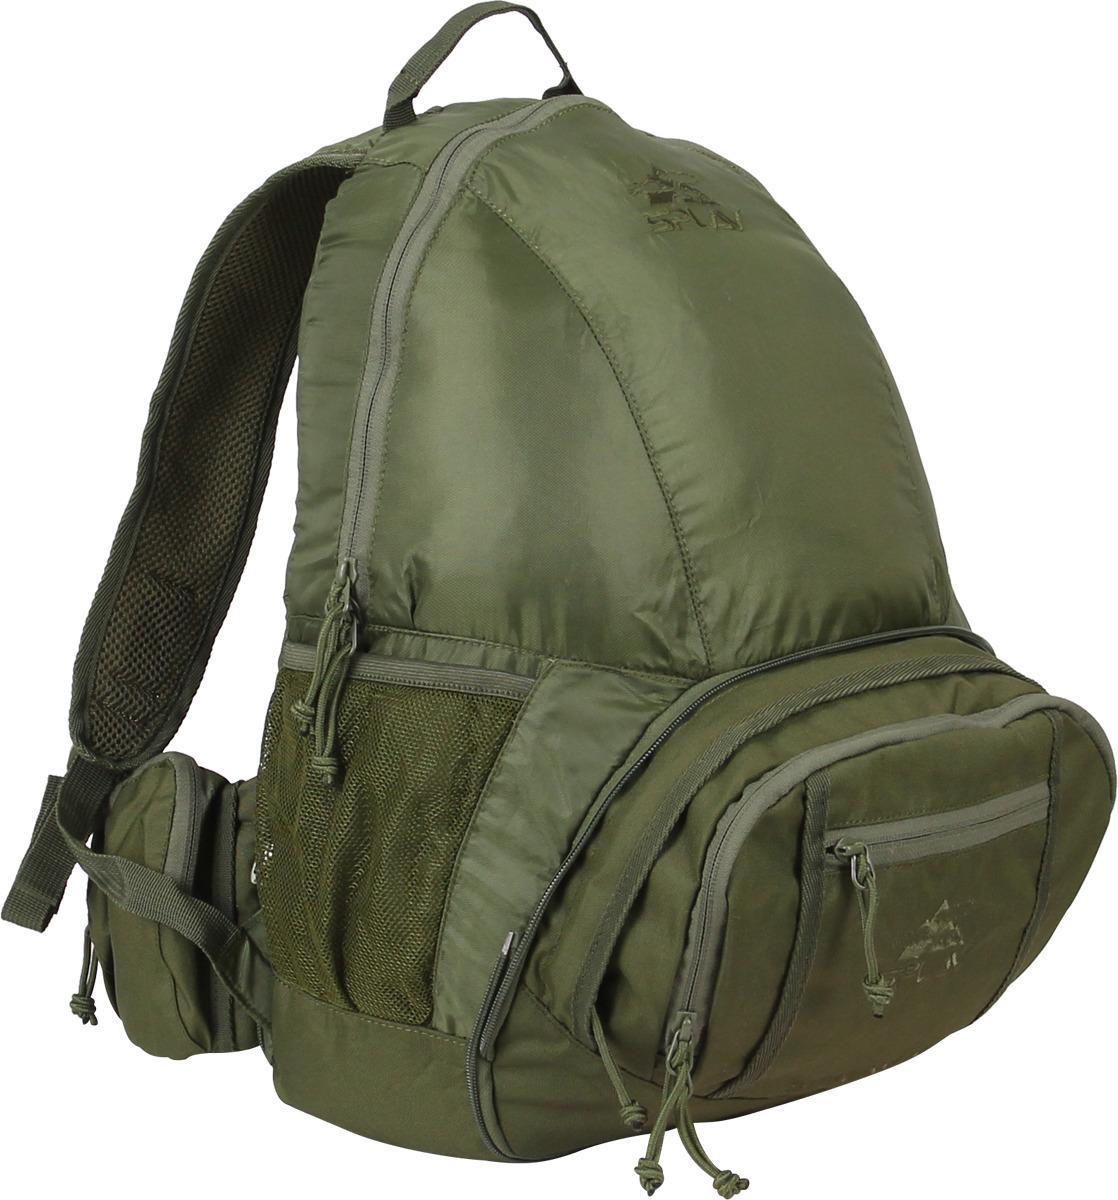 Рюкзак Сплав Stream, 5027450, зеленый т рюкзак punta cana